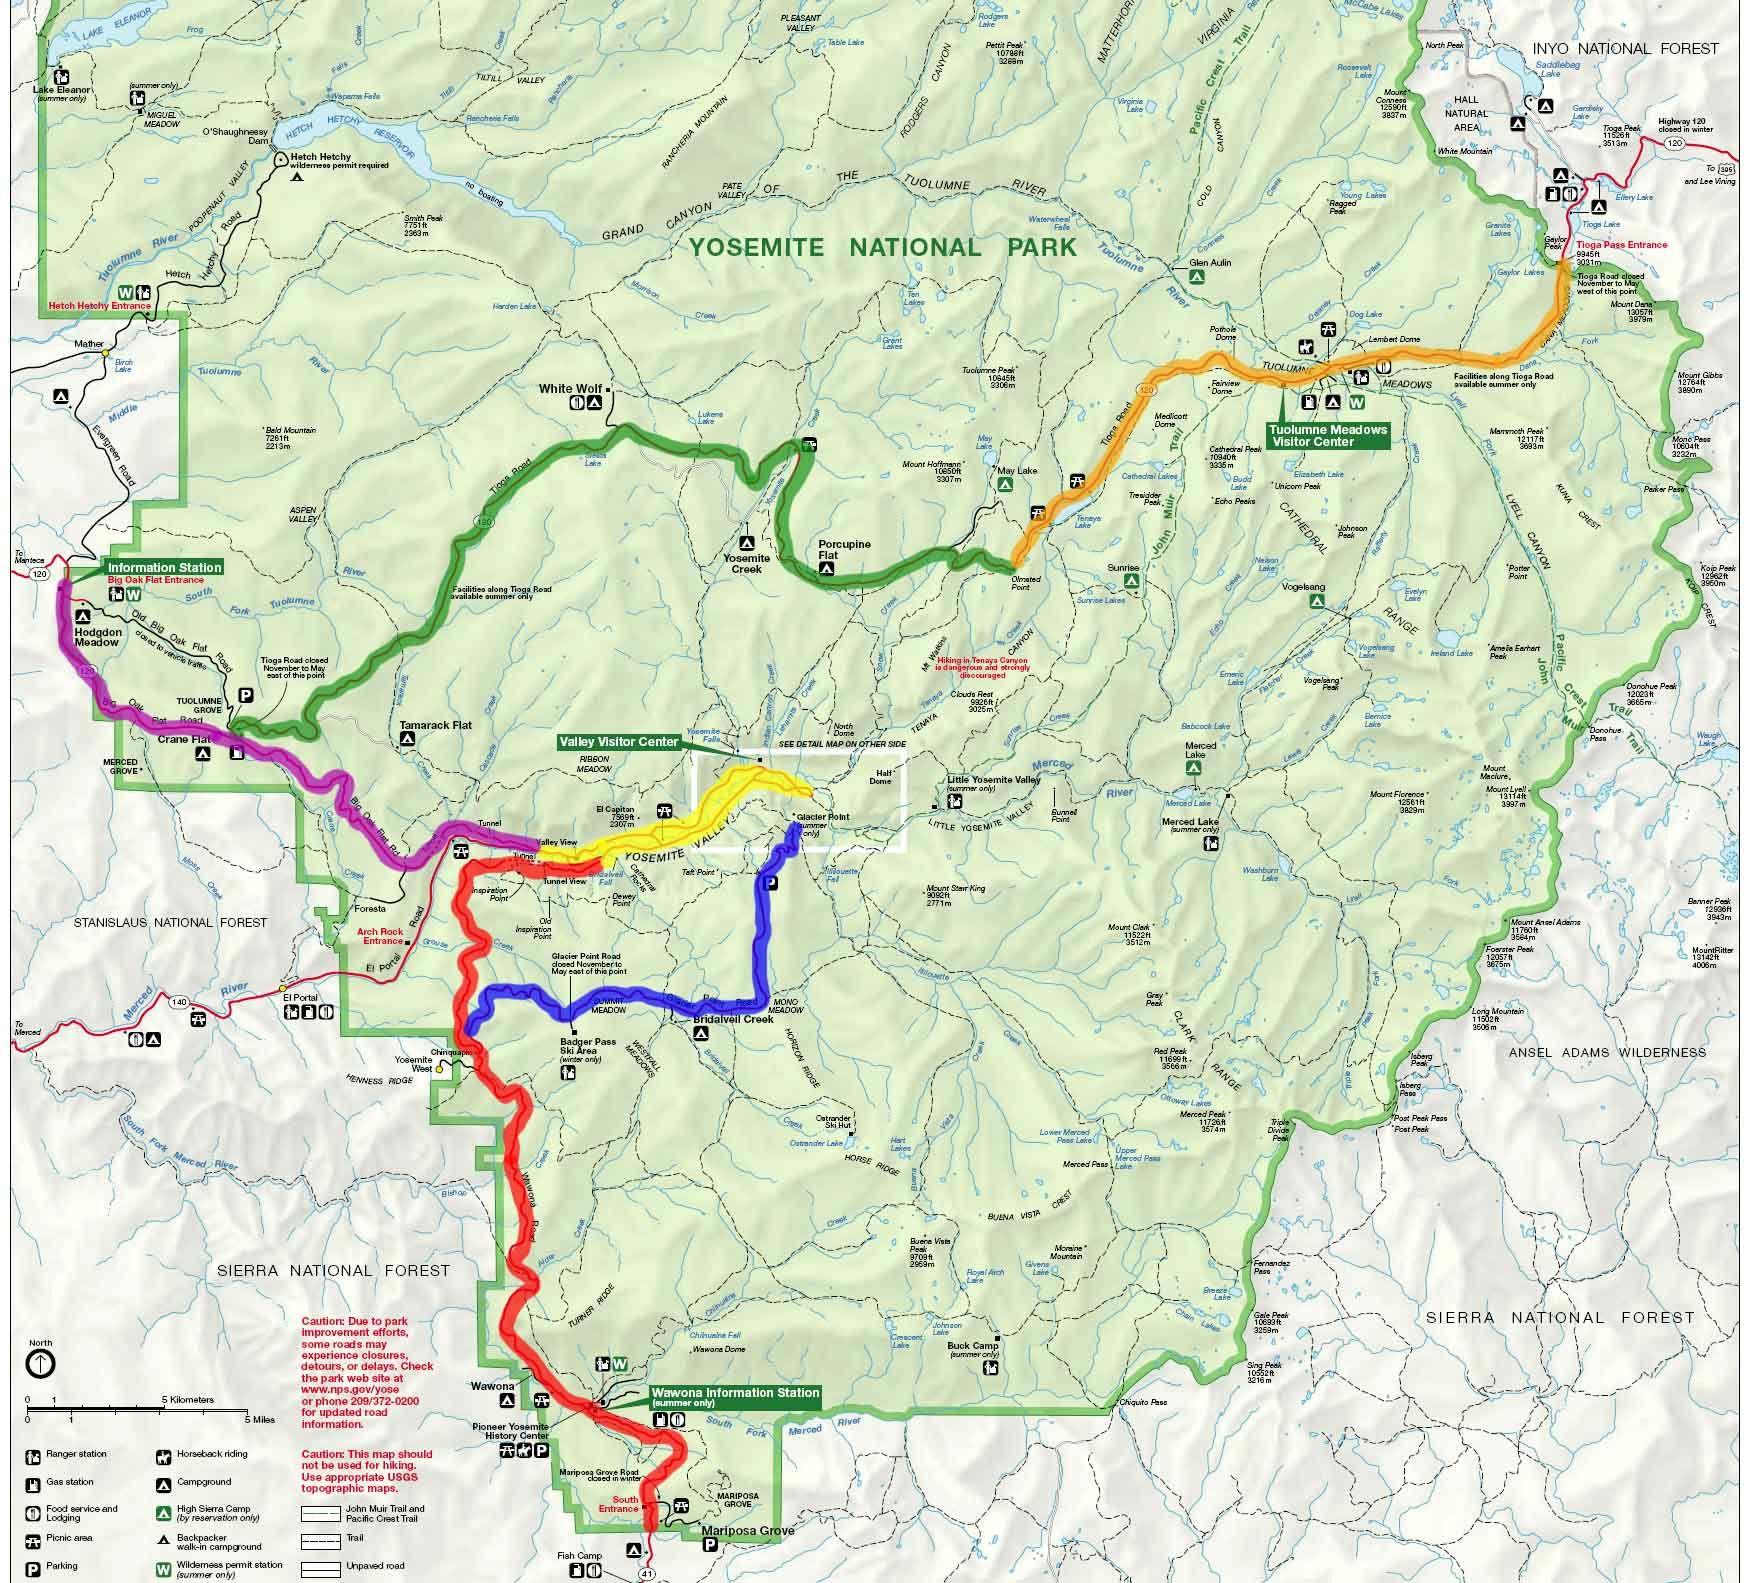 Yosemite National Park Scenic Drives Locator Map | West Coast ...